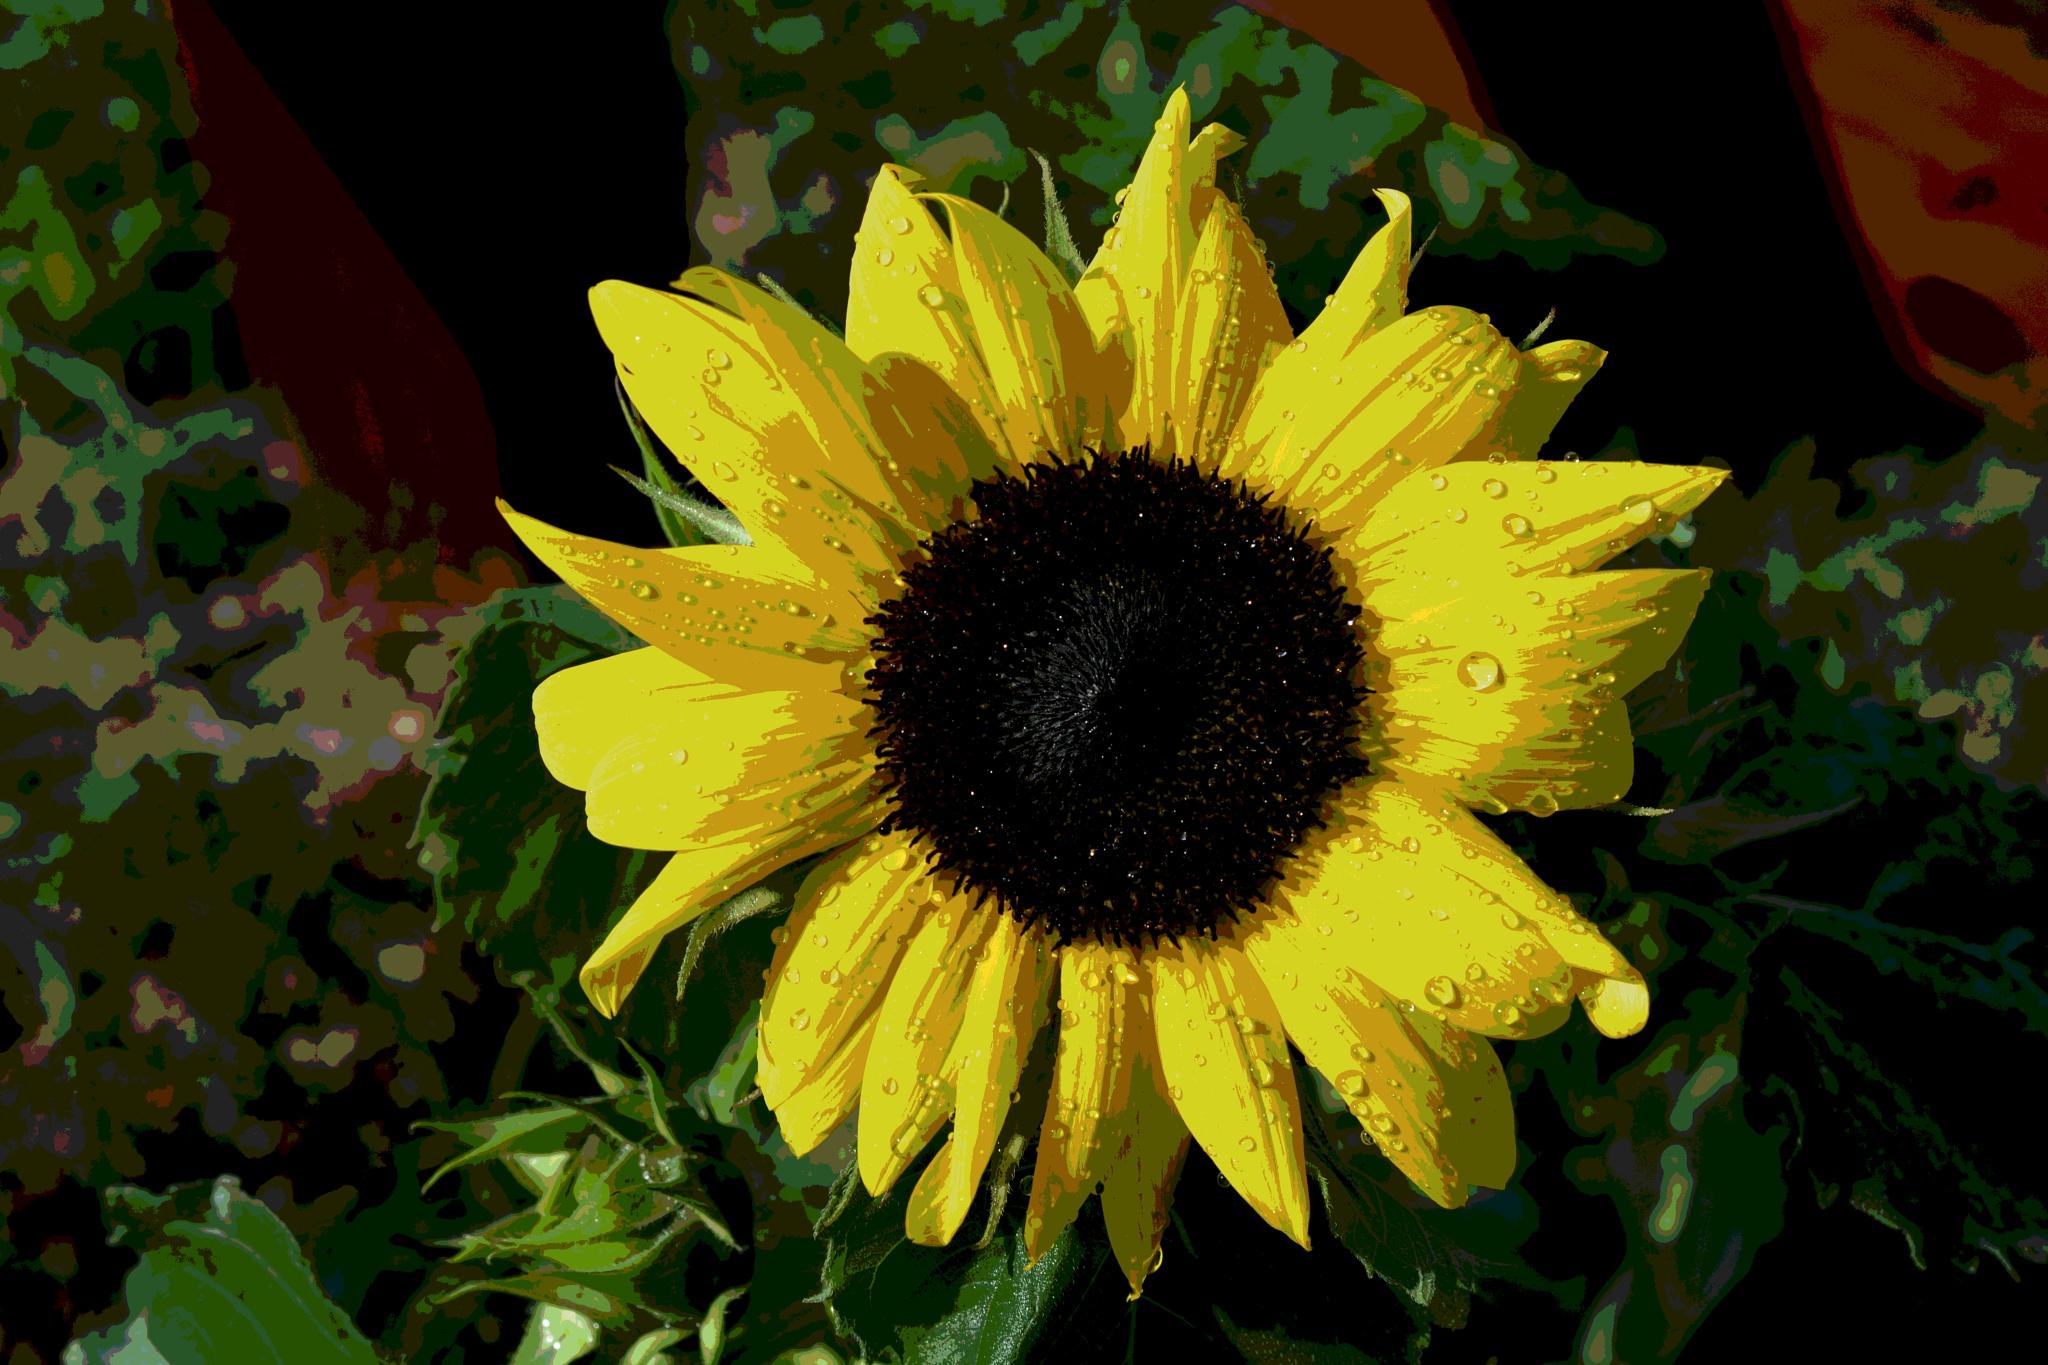 sunflower by pgavin5000